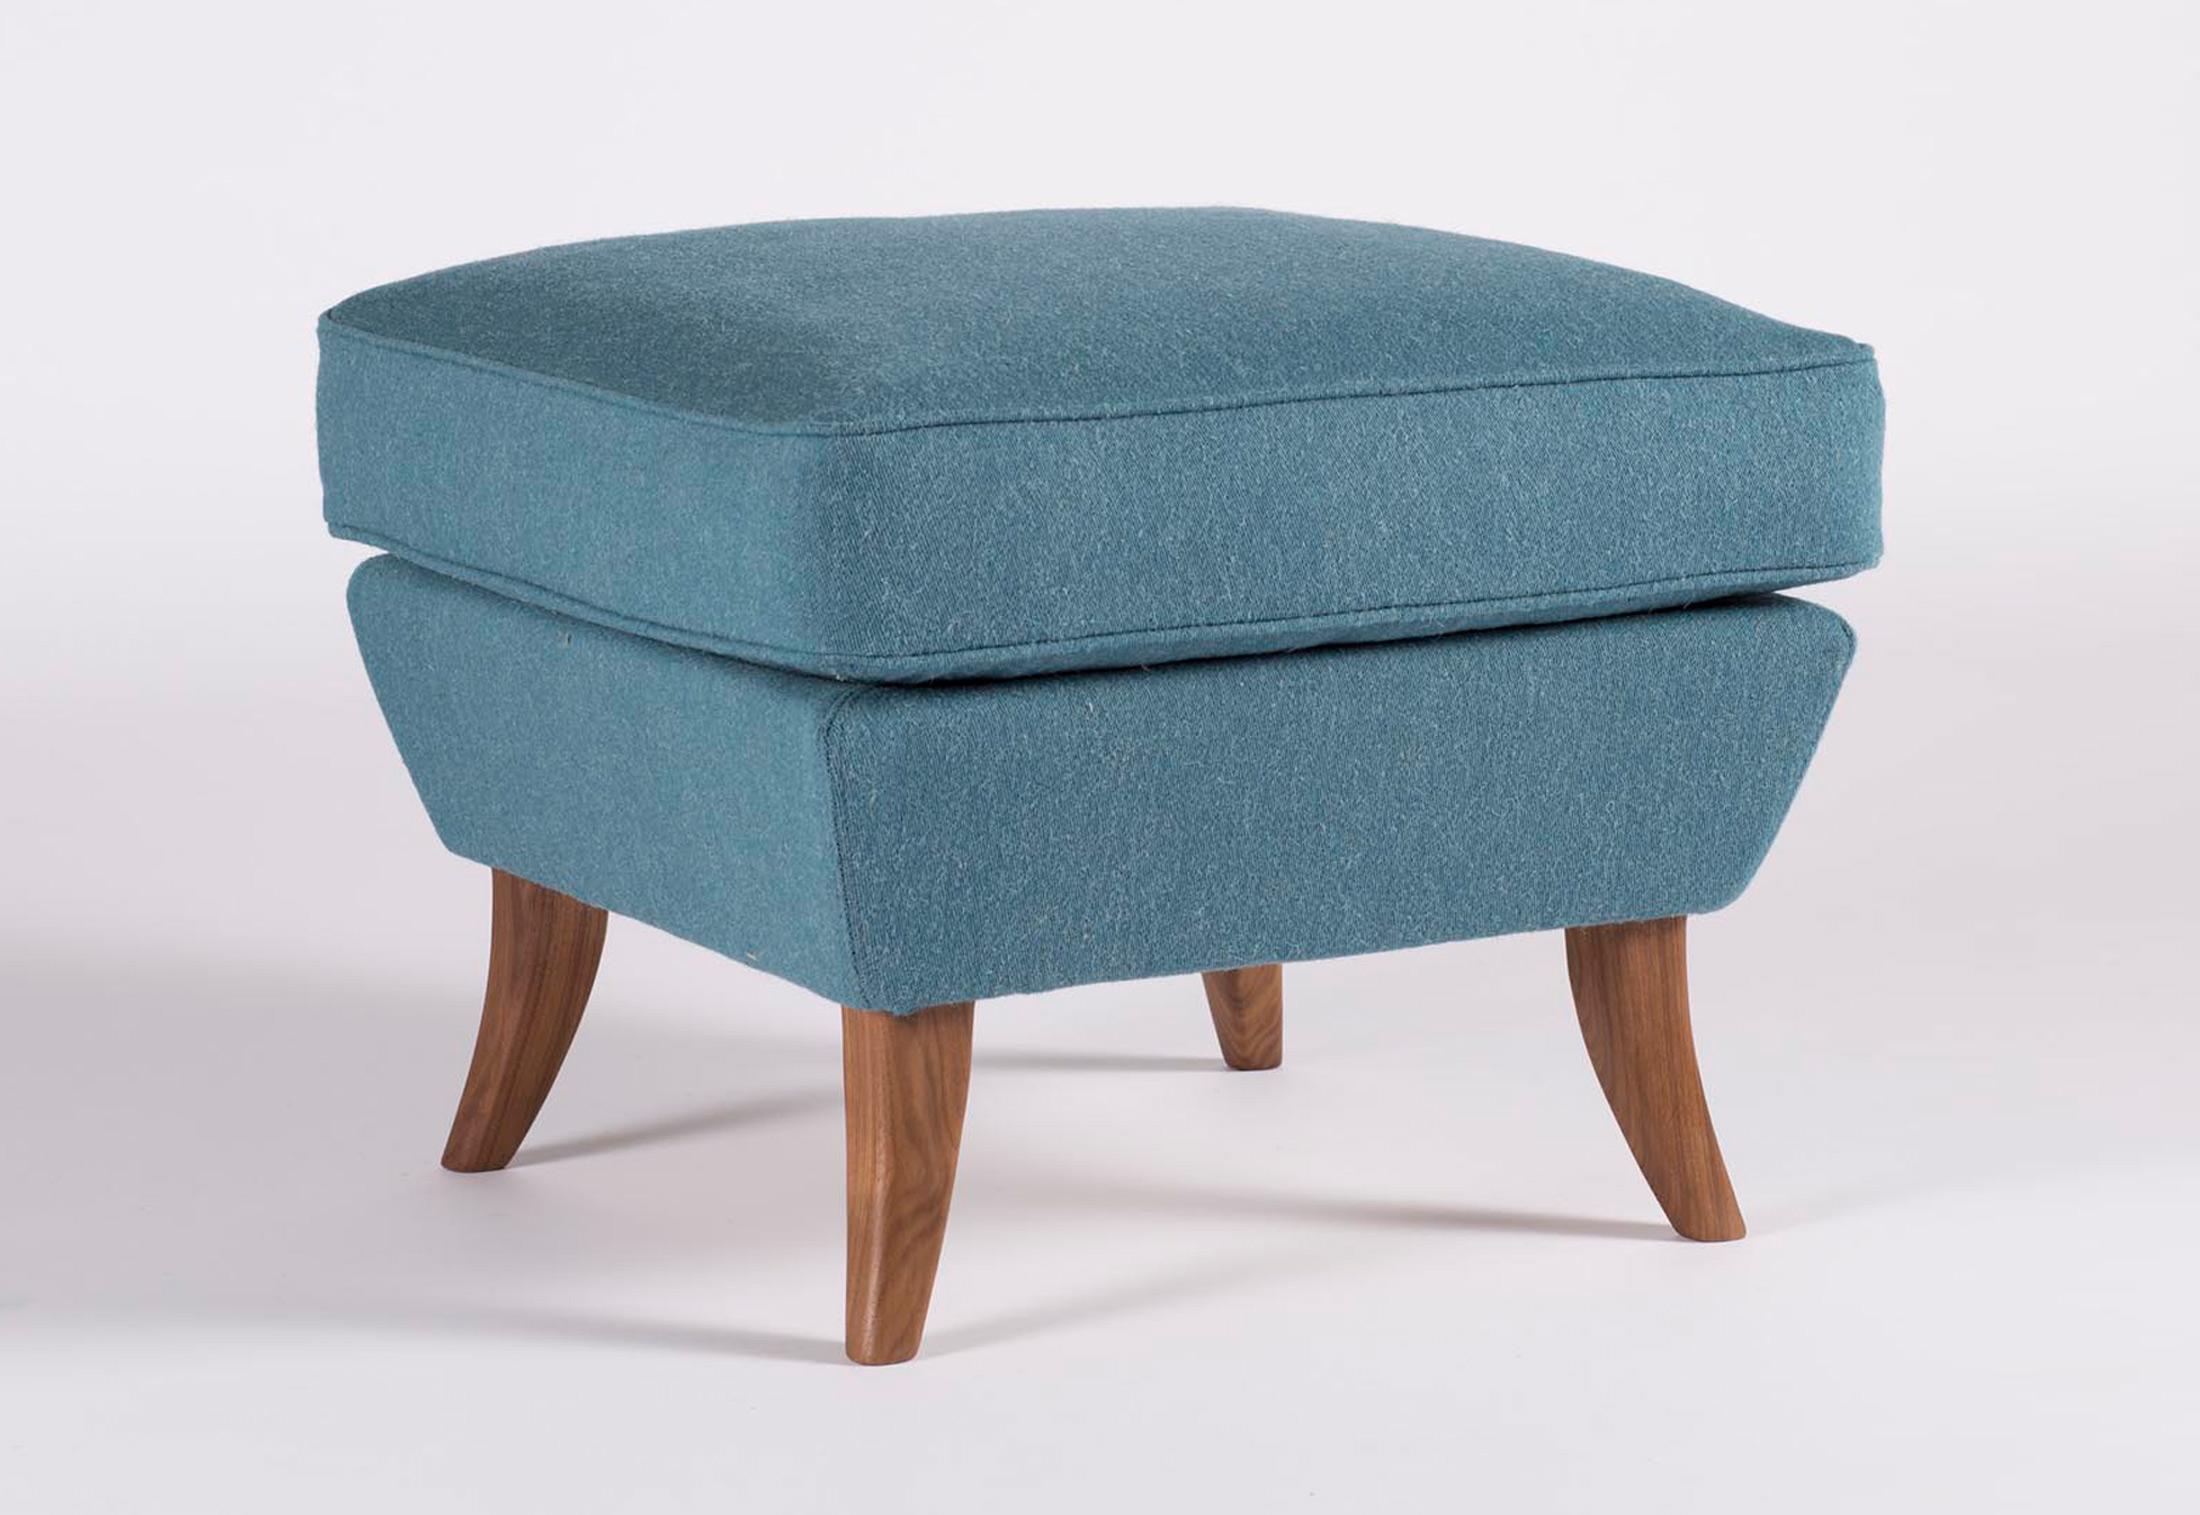 schwadron stool by wohnkultur 66 stylepark. Black Bedroom Furniture Sets. Home Design Ideas